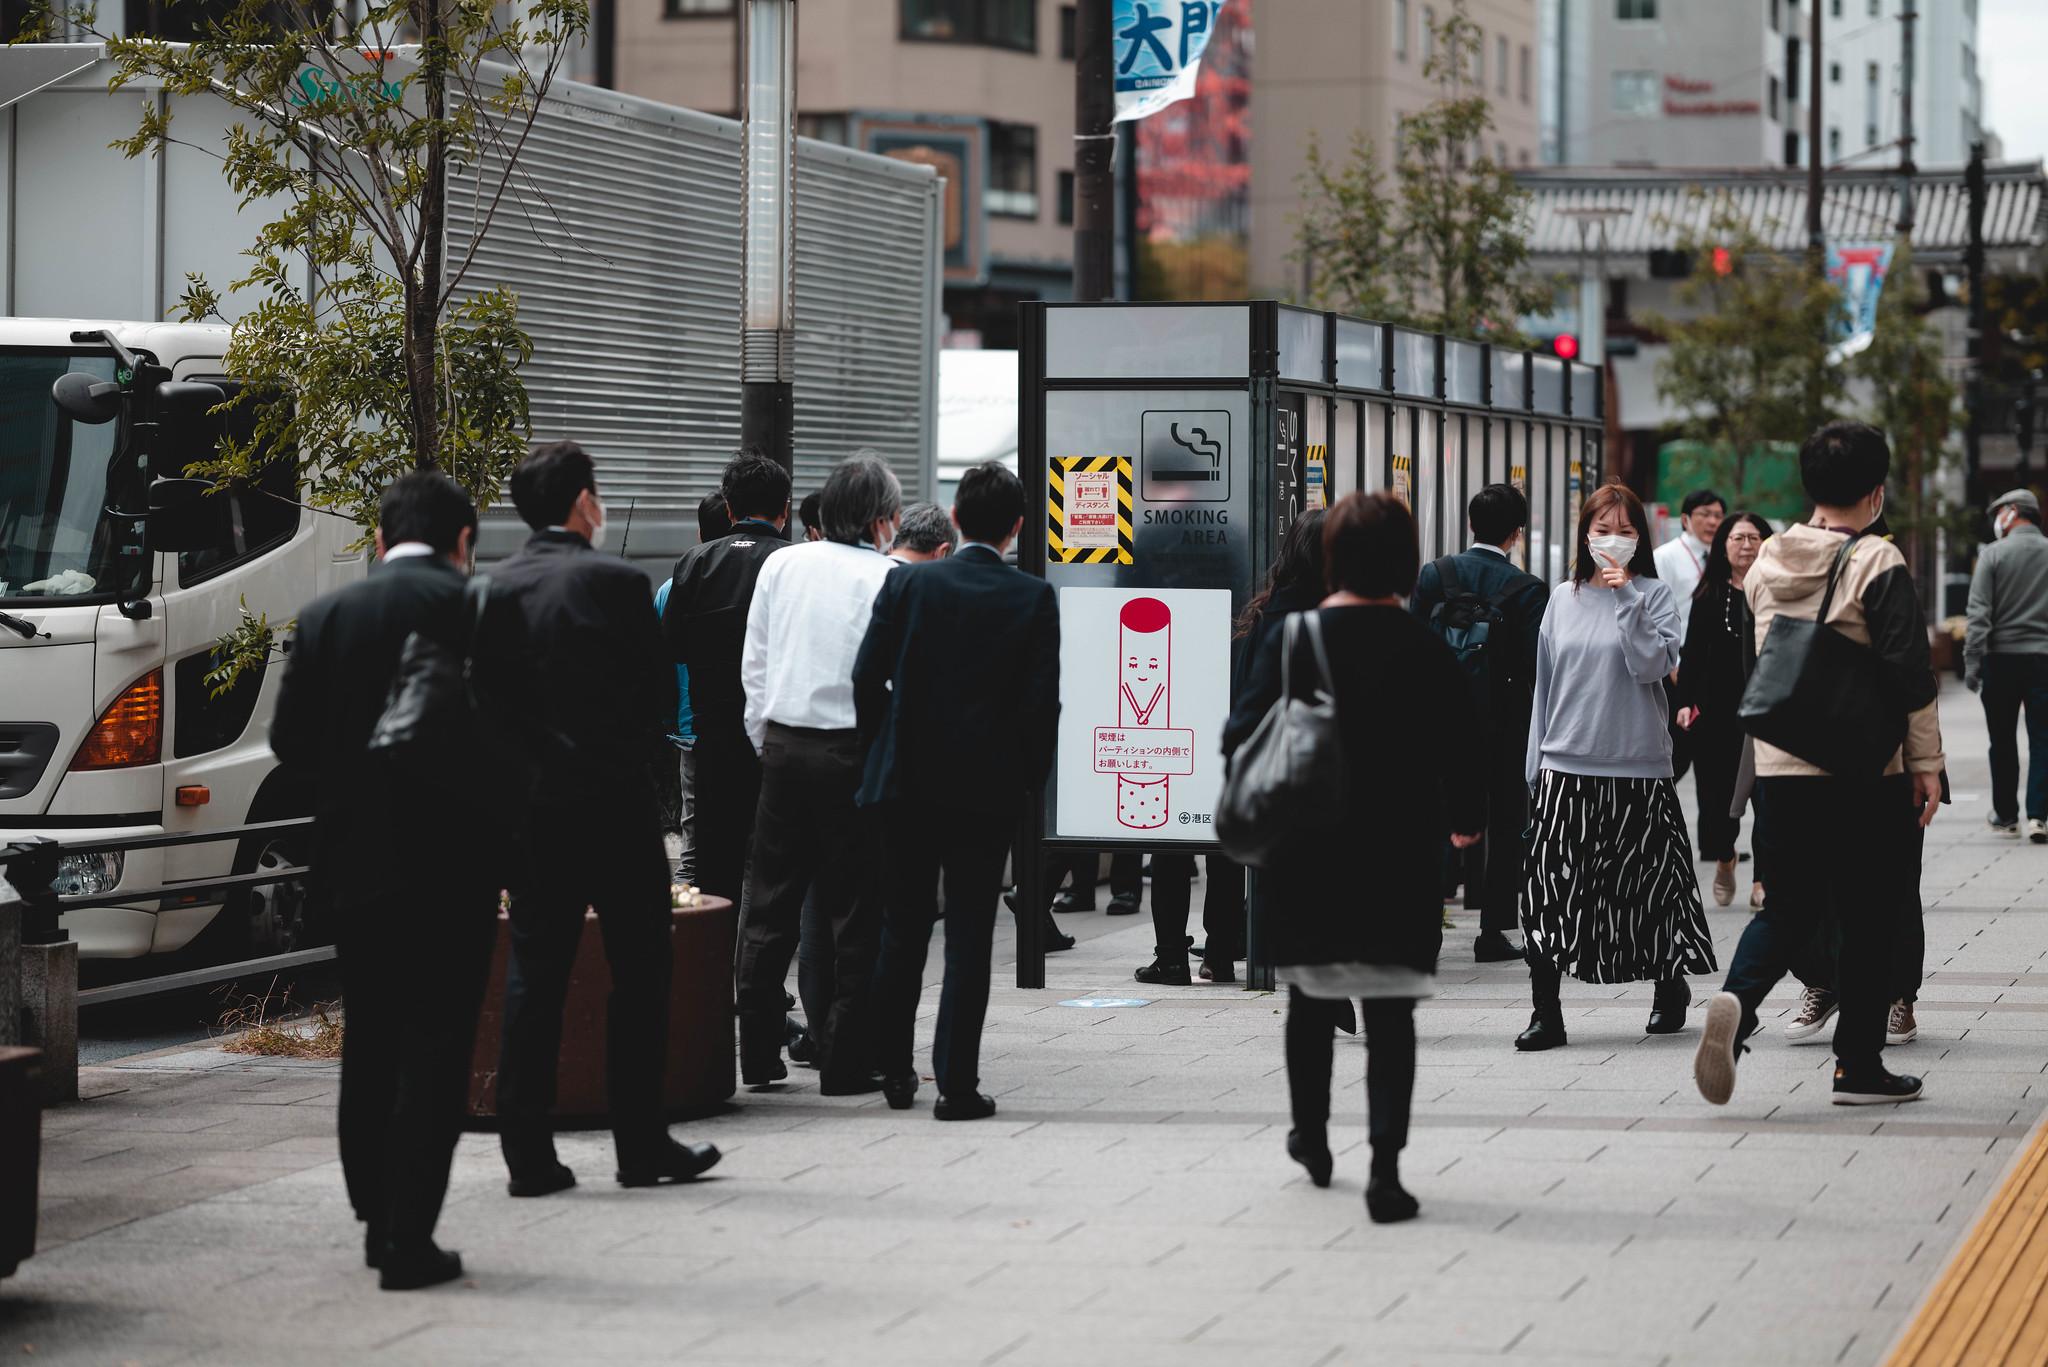 Smoking area with a queue